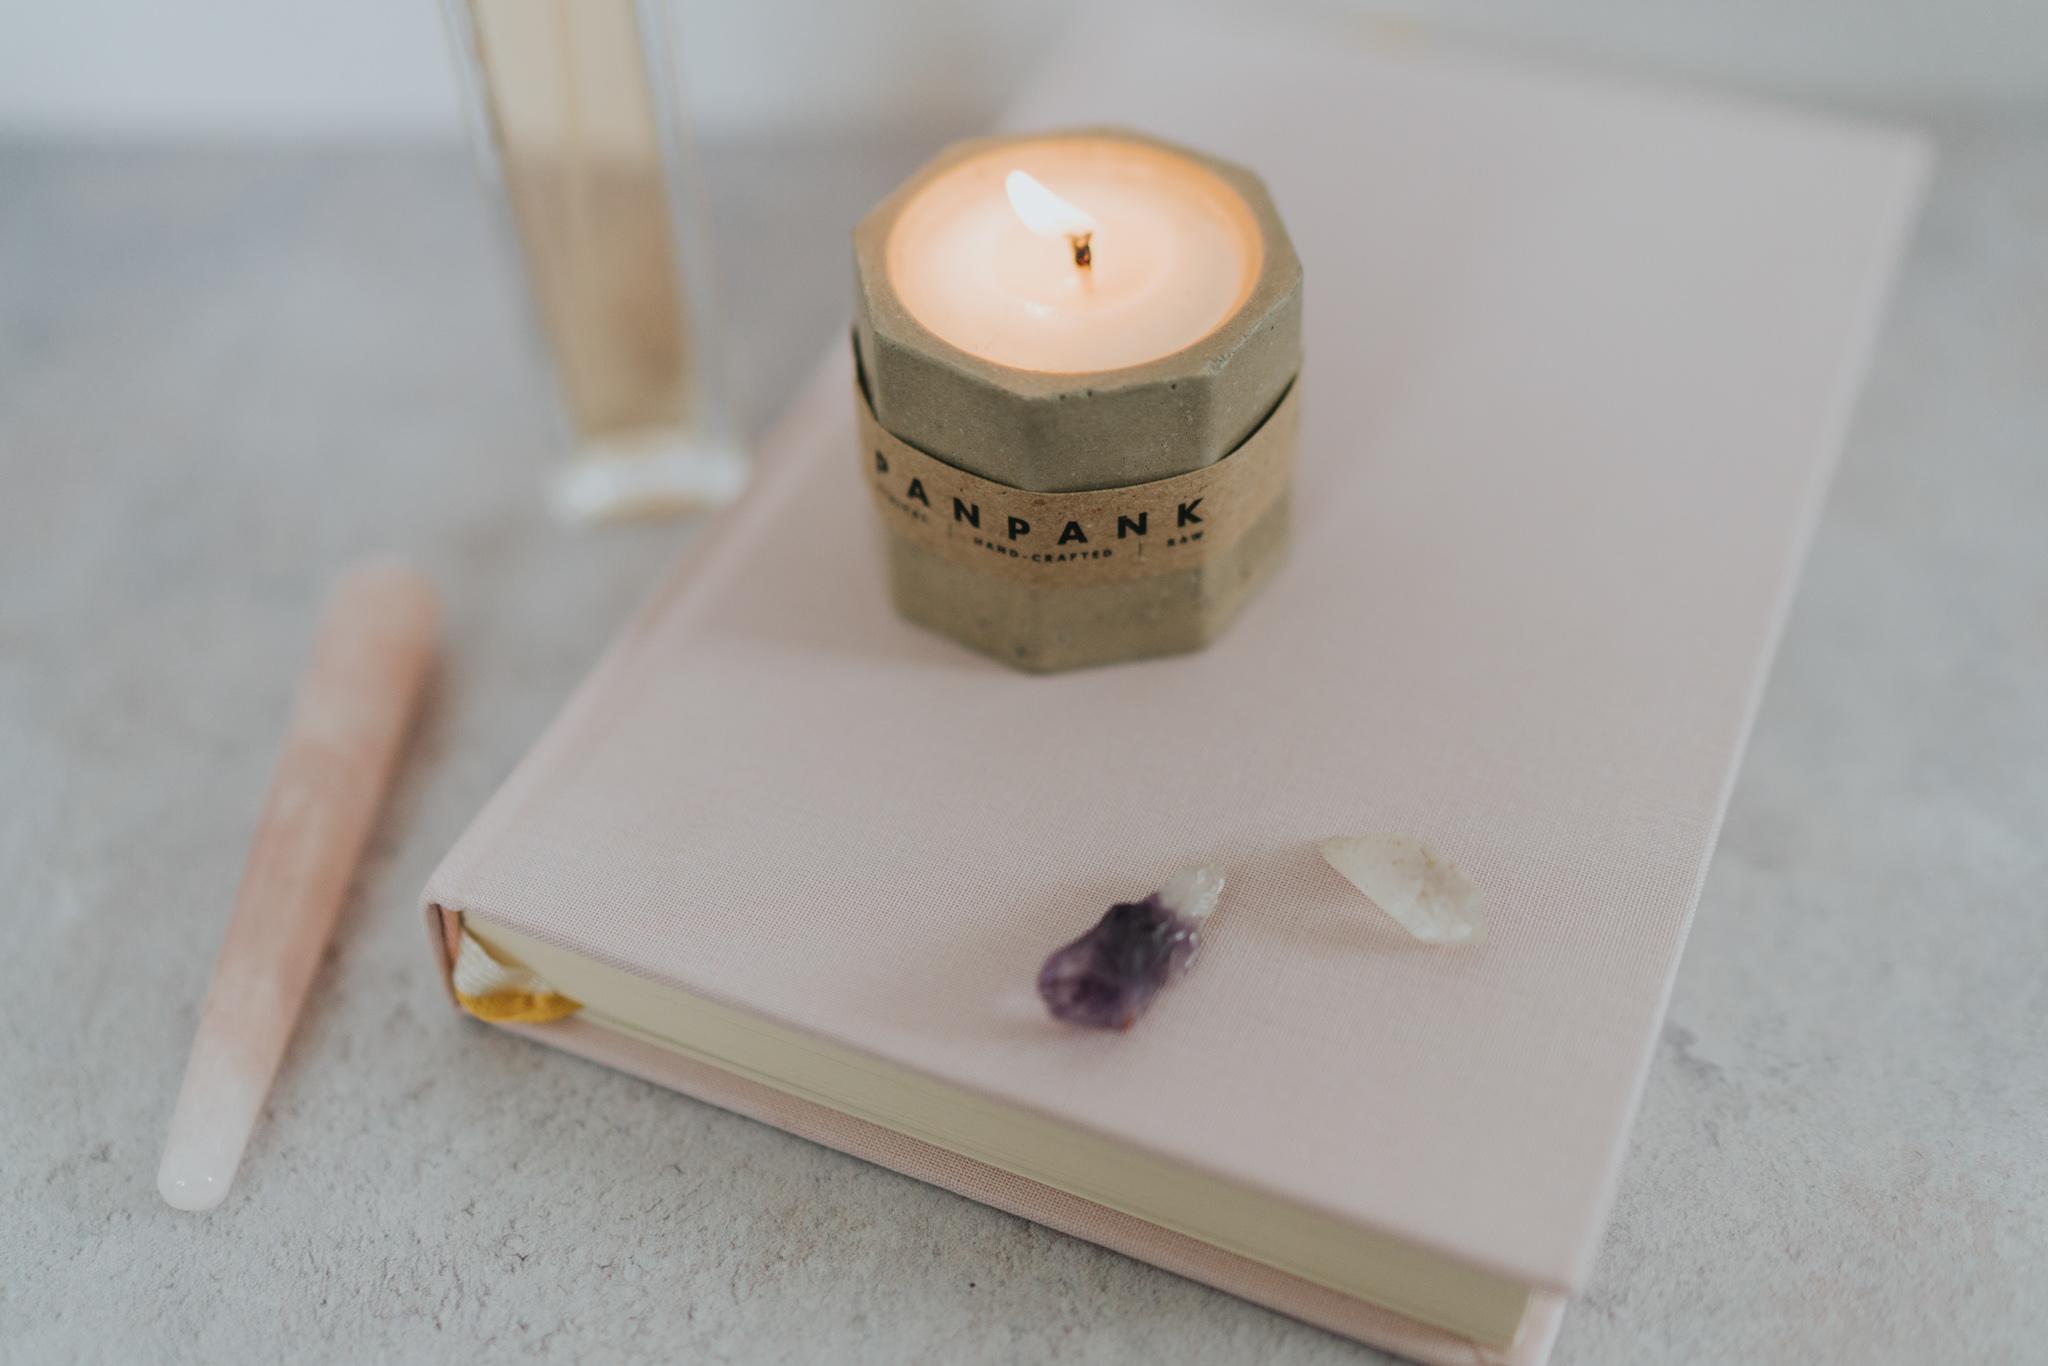 business-branding-panpank-candles-grace-elizabeth-colchester-essex-devon-suffolk-and-norfolk-alternative-wedding-and-family-photographer (16 of 19).jpg